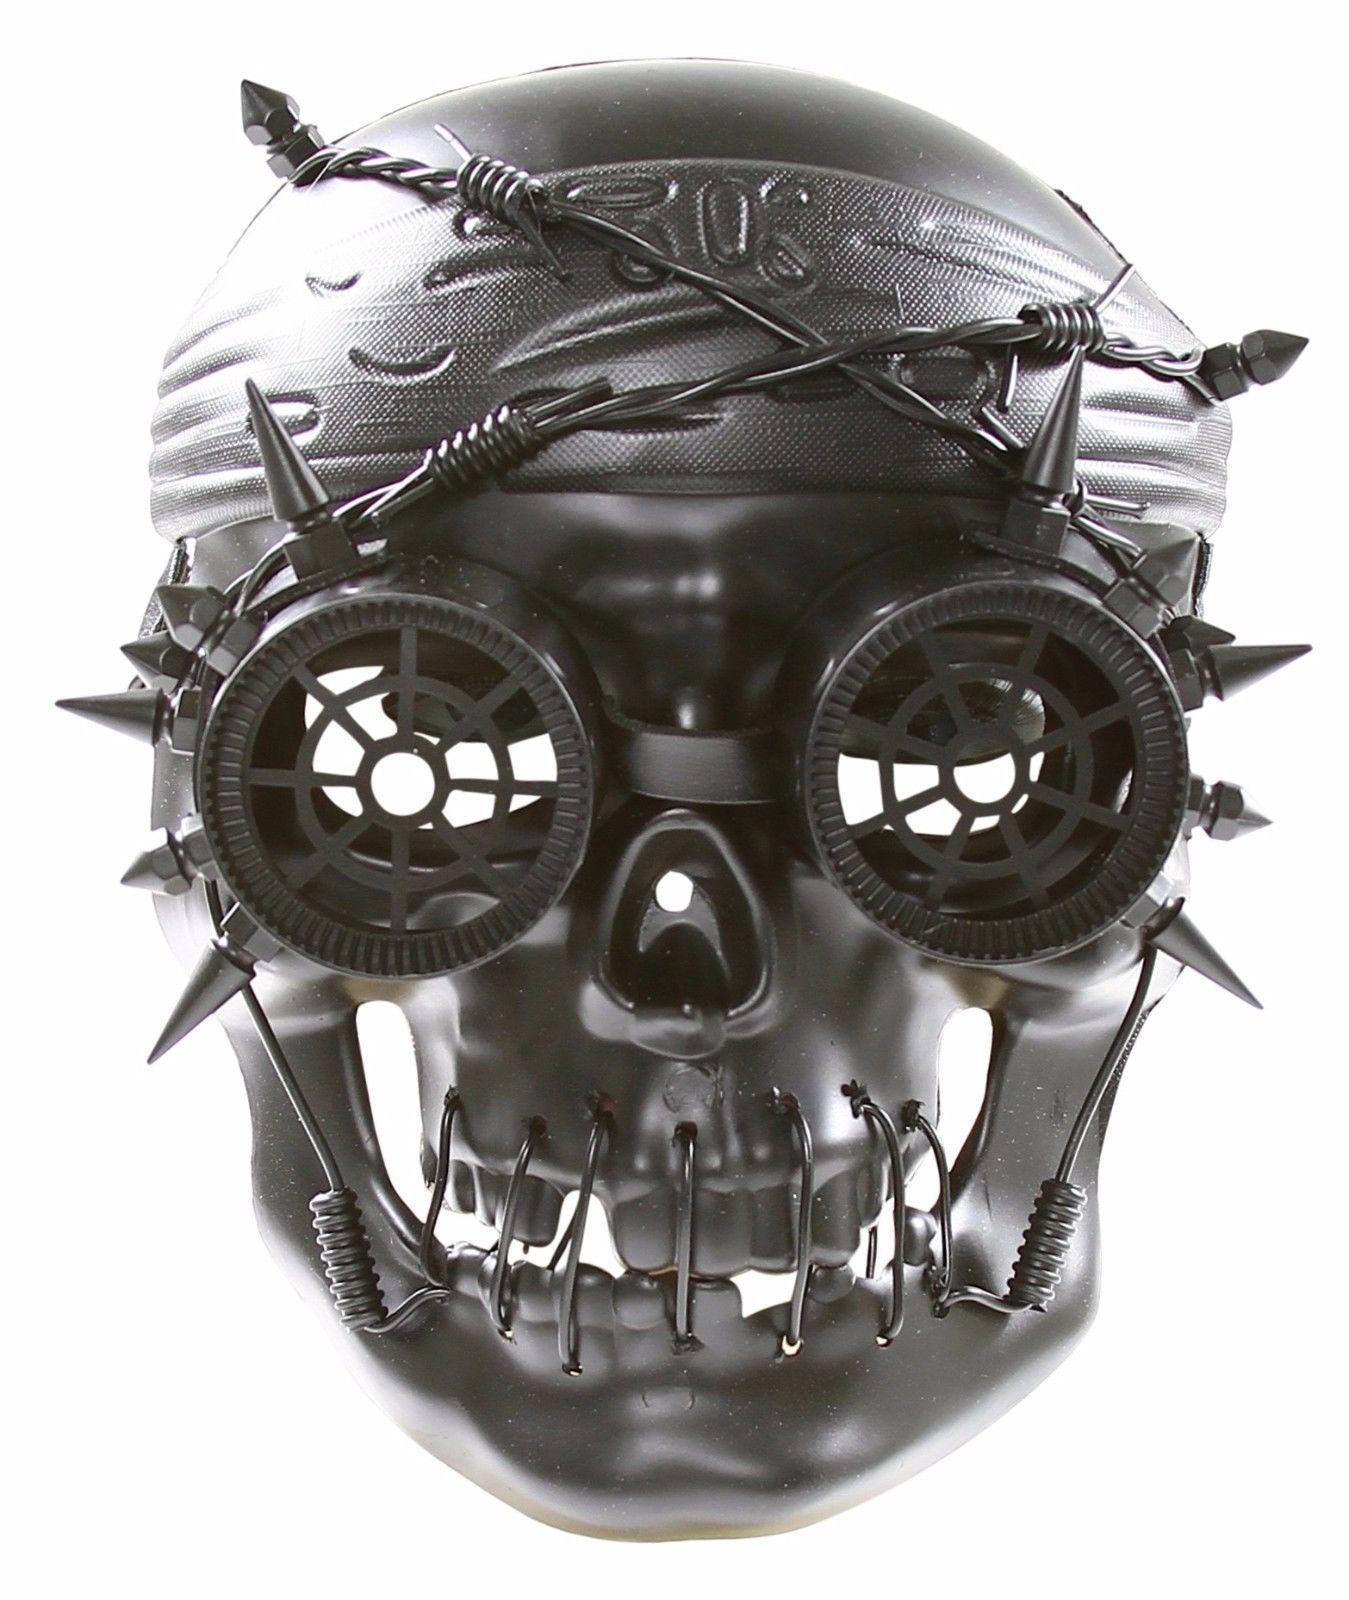 Silver Apocalypse Steam Punk Skull Mask Masquerade Costume Halloween Goth